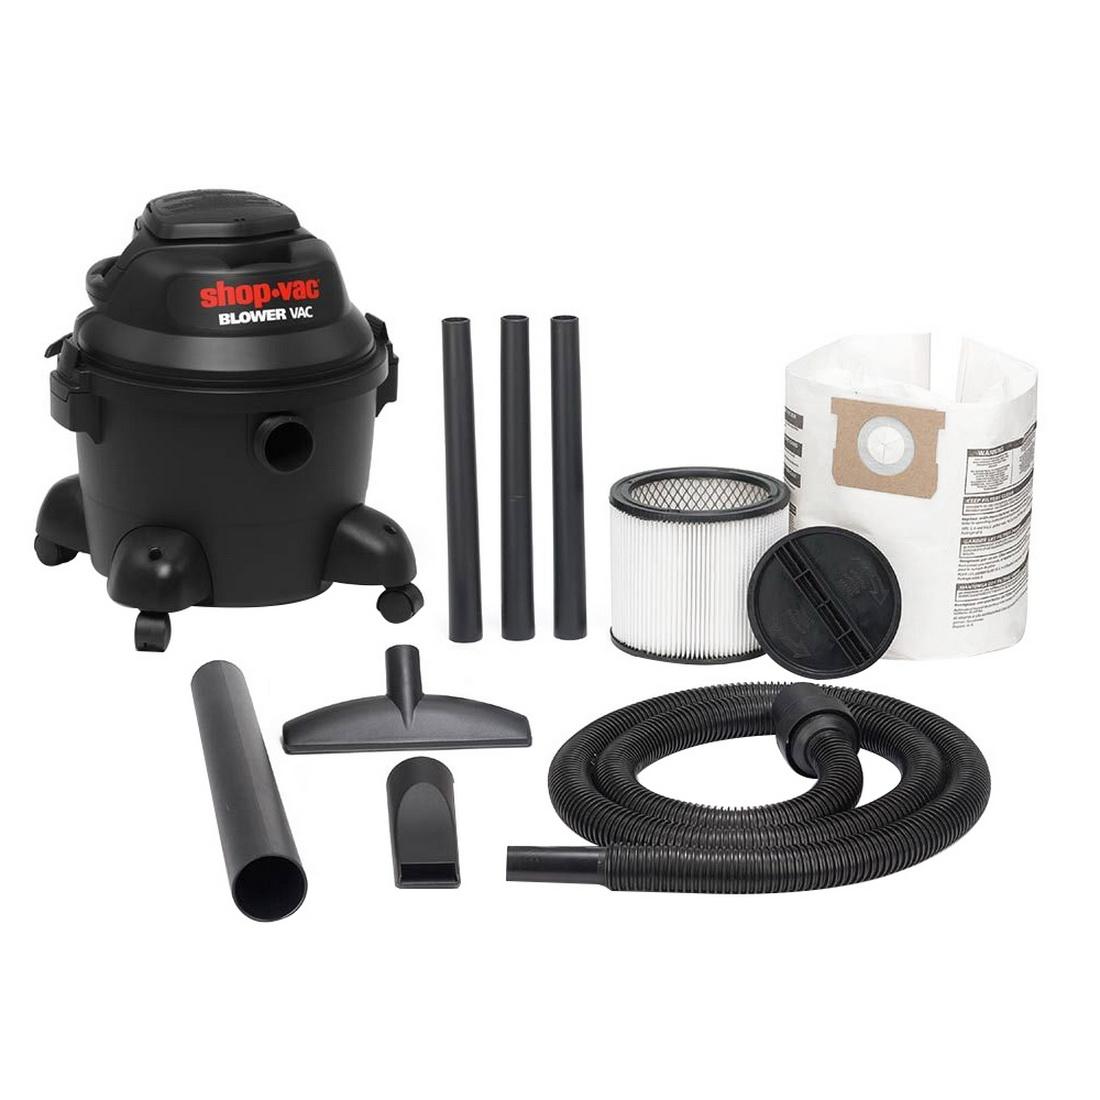 1400W 25L Wet/Dry Vacuum Blower W/Detachable Blower Motor Top